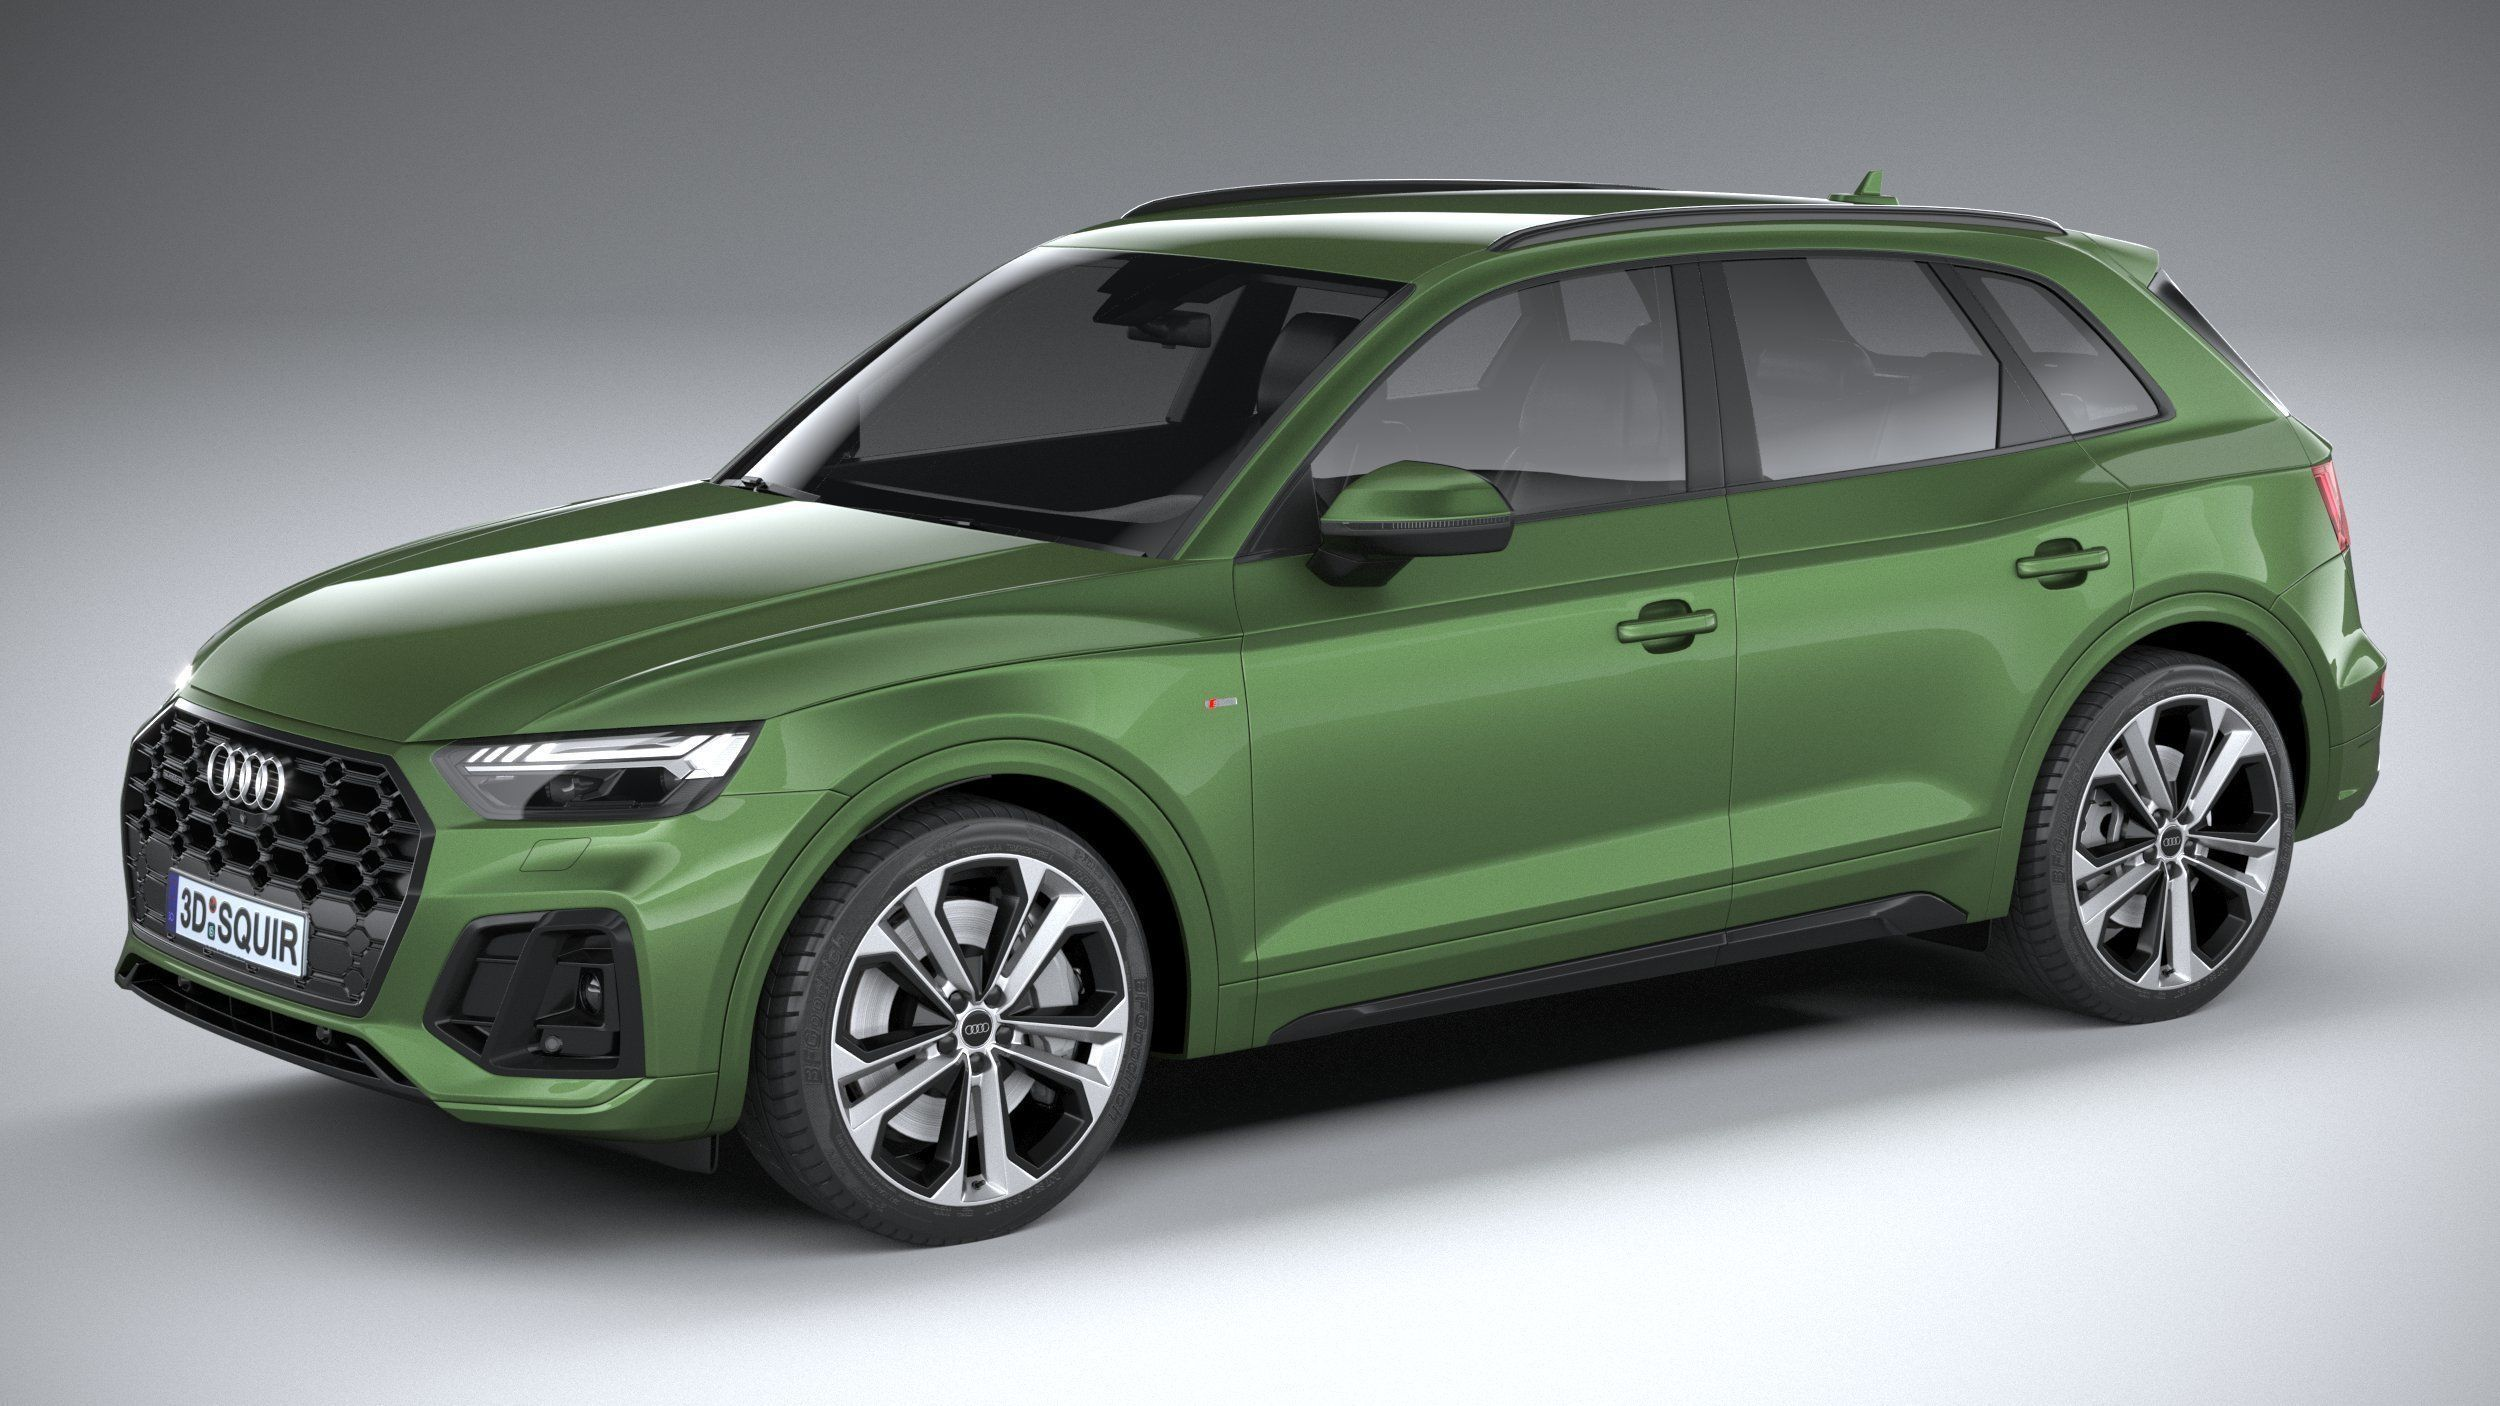 Audi Q5 S-line 2021